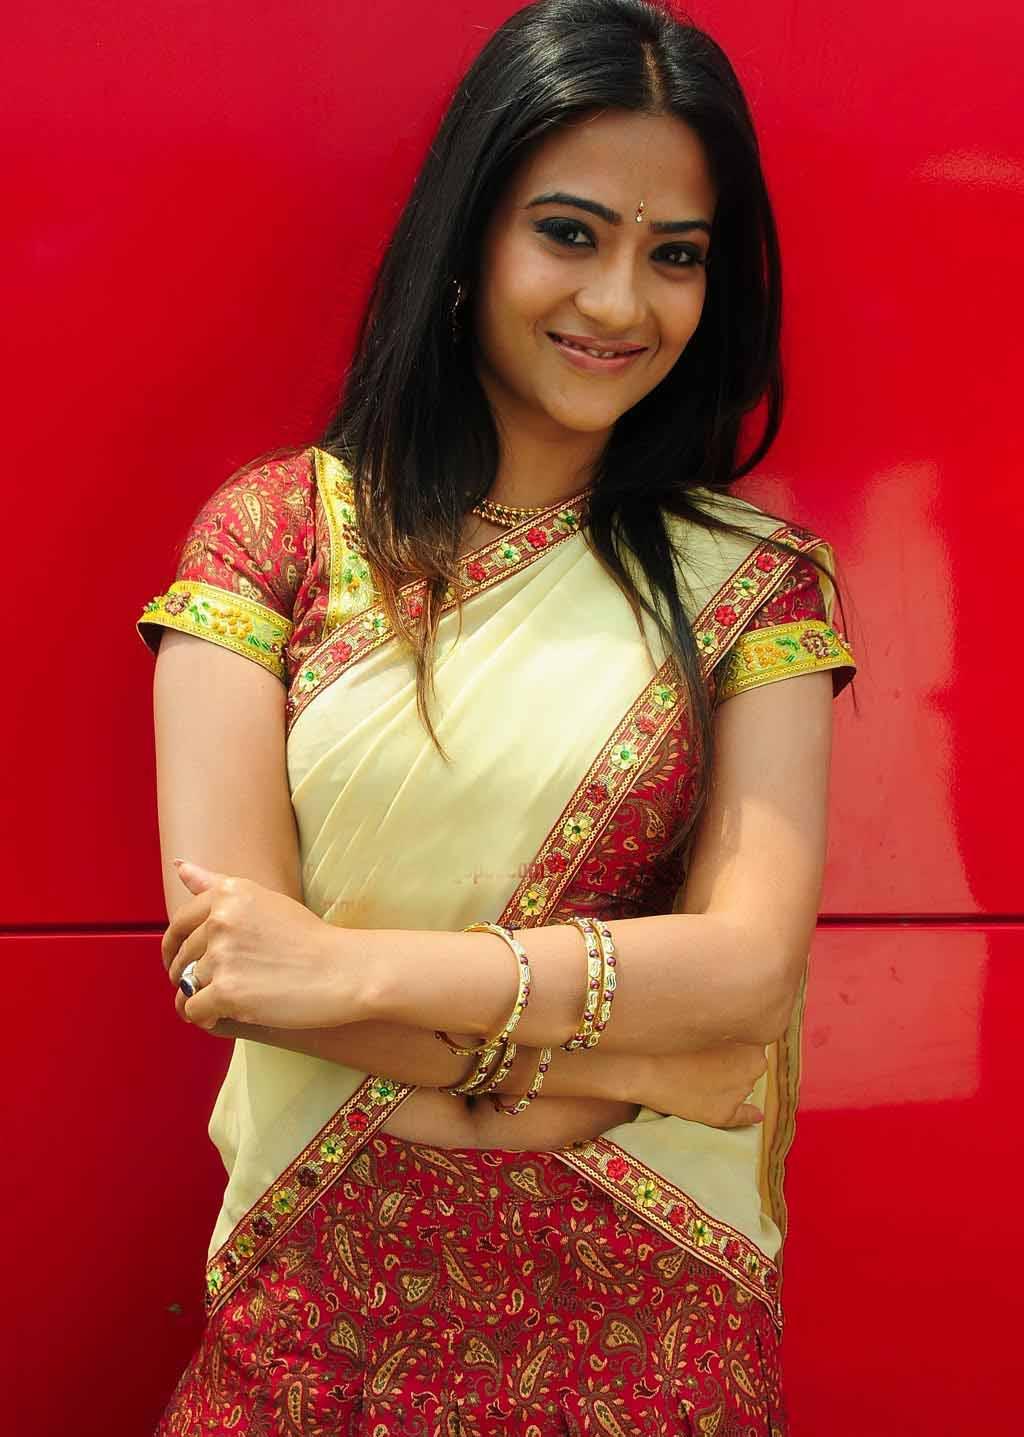 telugu-actress-adithi-sharma-hot-sexy-stills Aditi Sharma 11+ Unseen Bikini Photograph, Scorching Horny Swimsuit Images Age & Toes Wiki